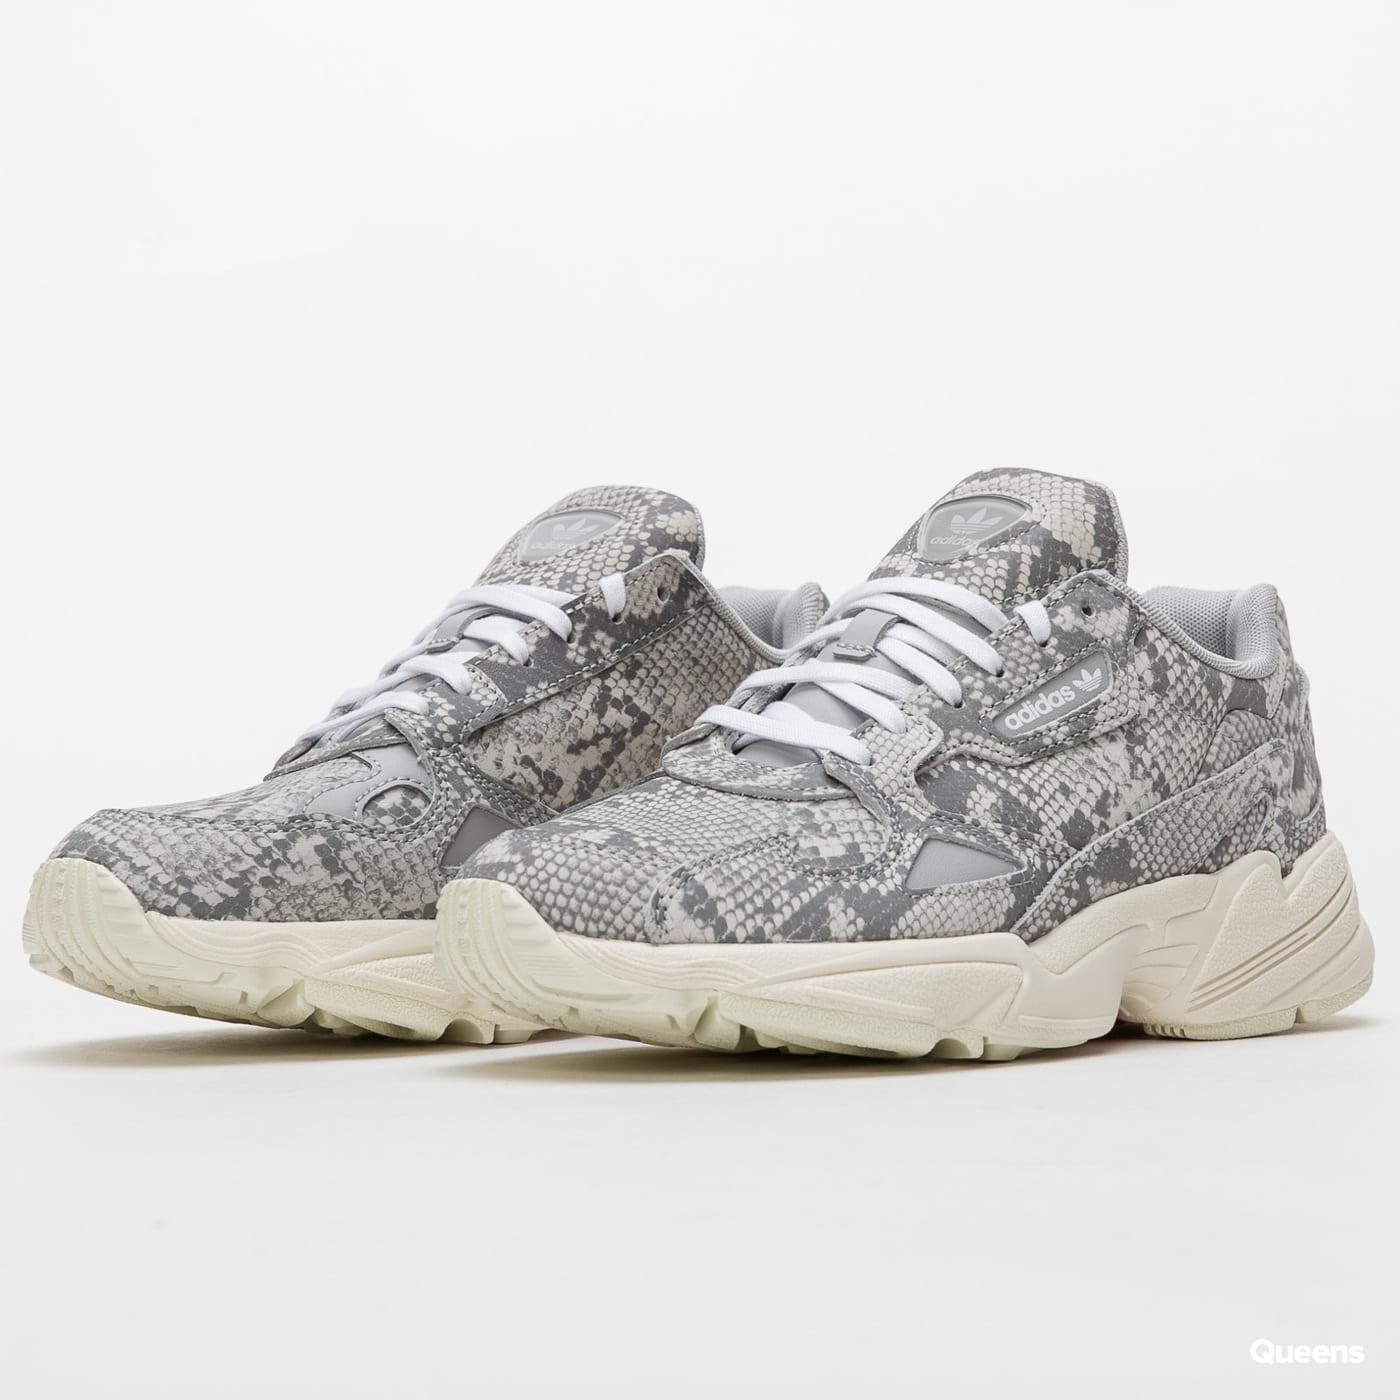 adidas Originals Falcon W owhite / gretwo / ftwwht